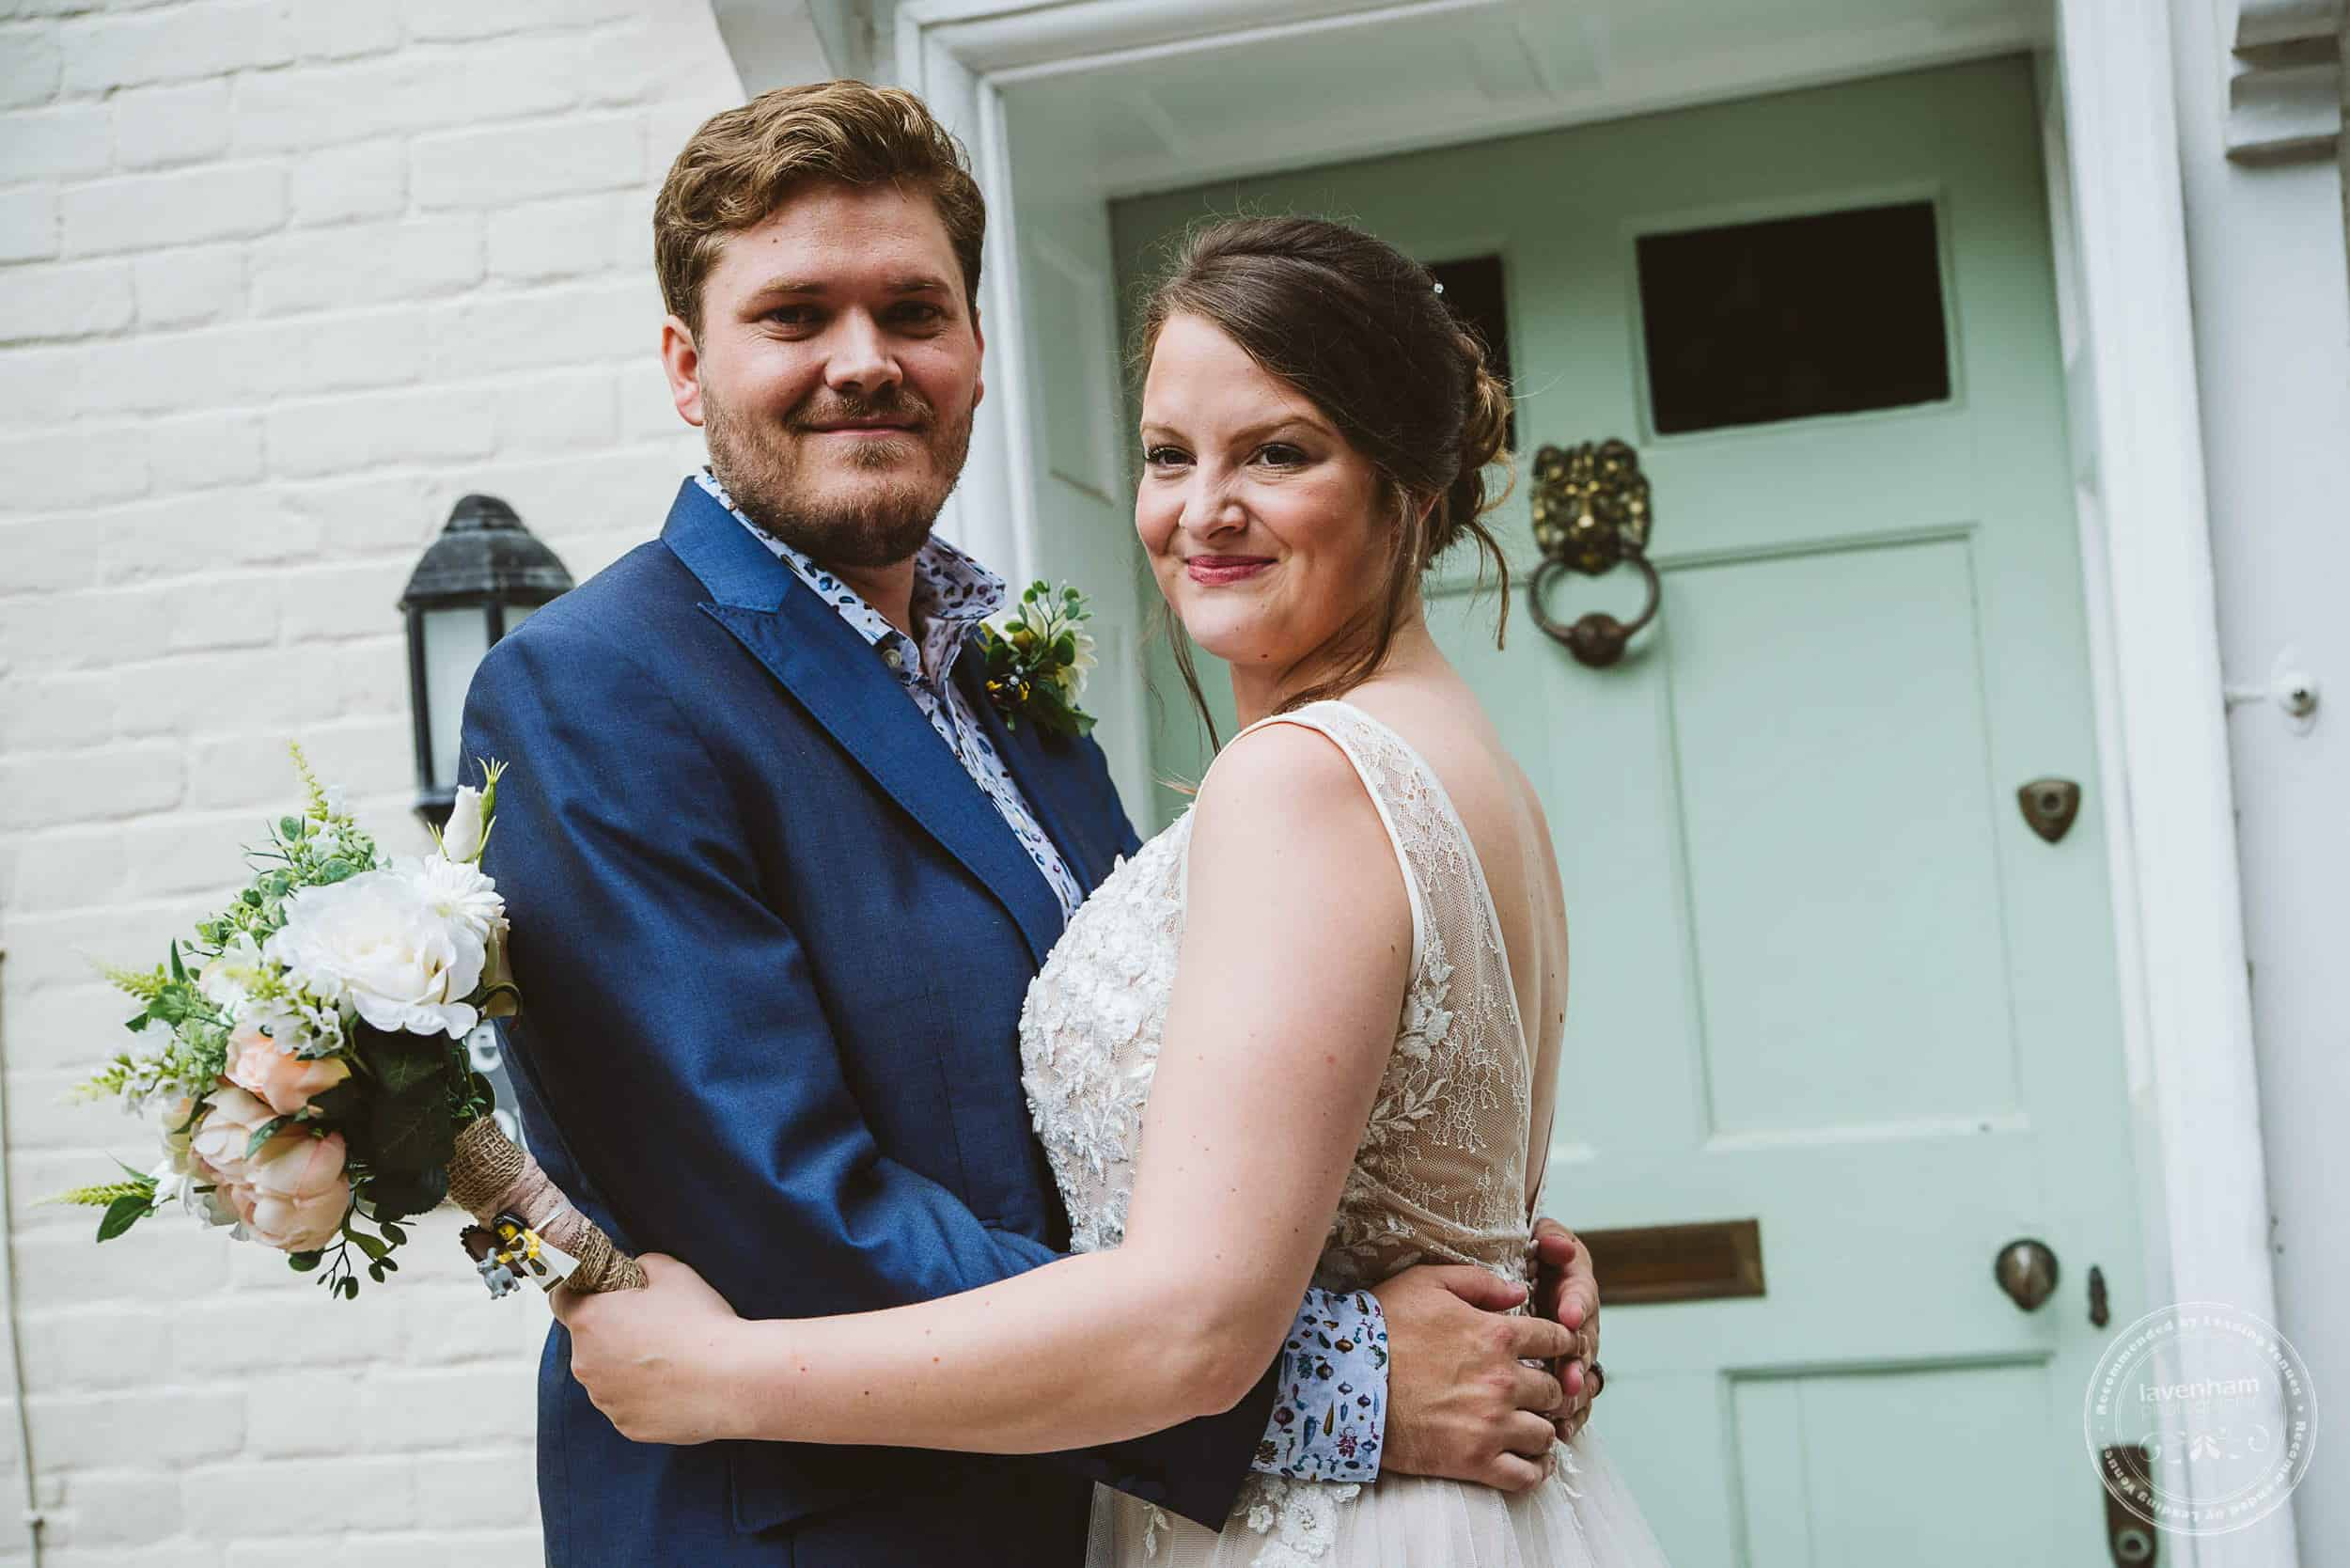 180818 Marks Hall Wedding Photography Lavenham Photographic 075